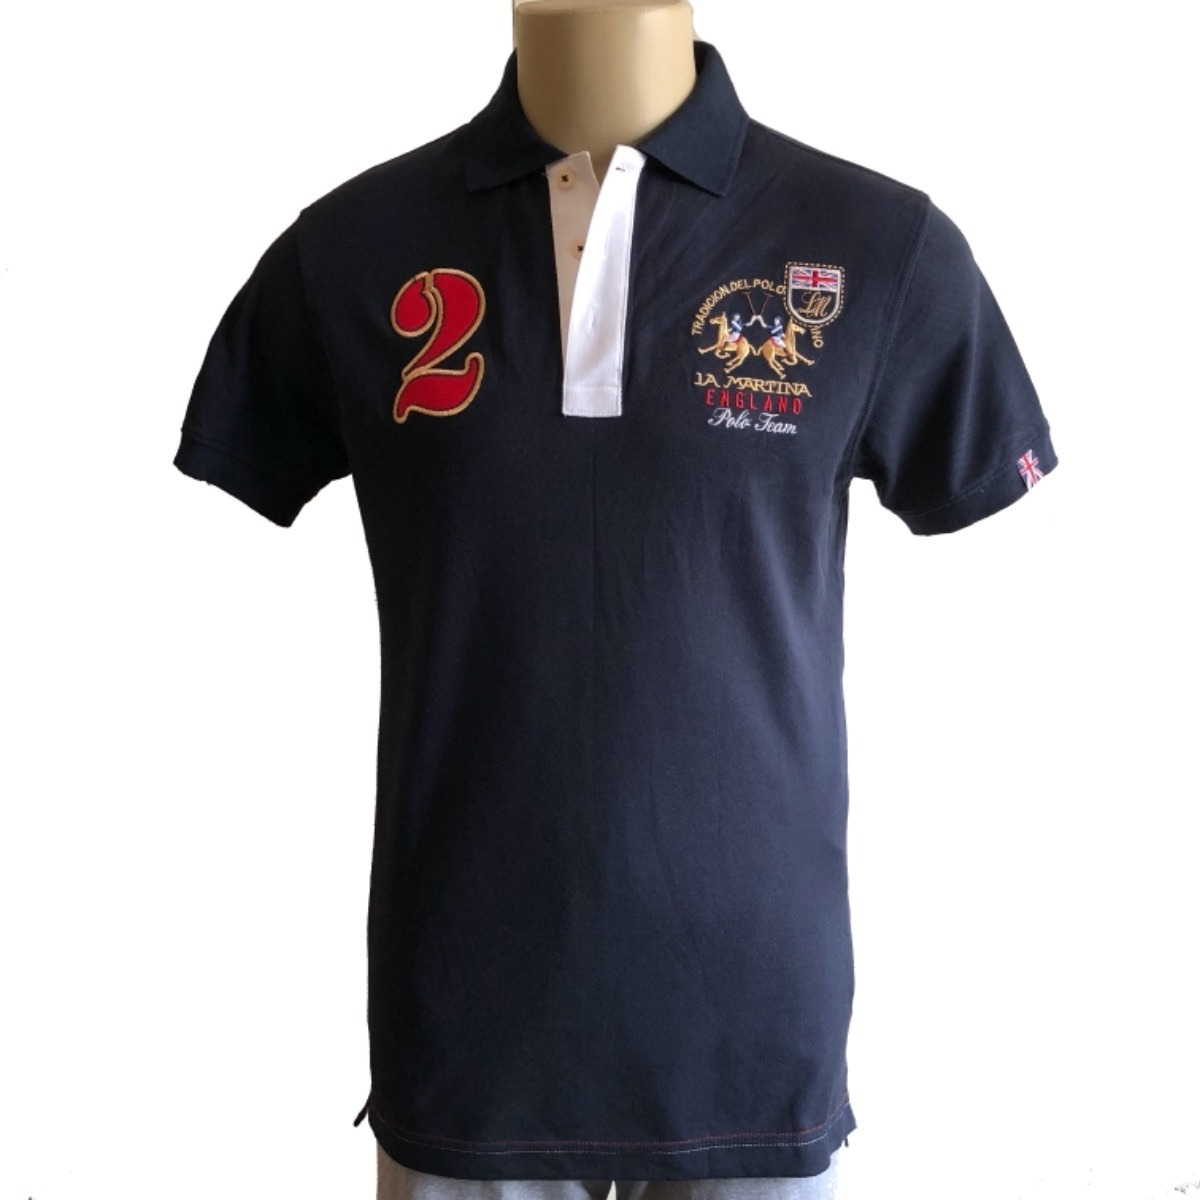 b7ce383204 camisa polo masculina la martina england   germany bordada. Carregando zoom.